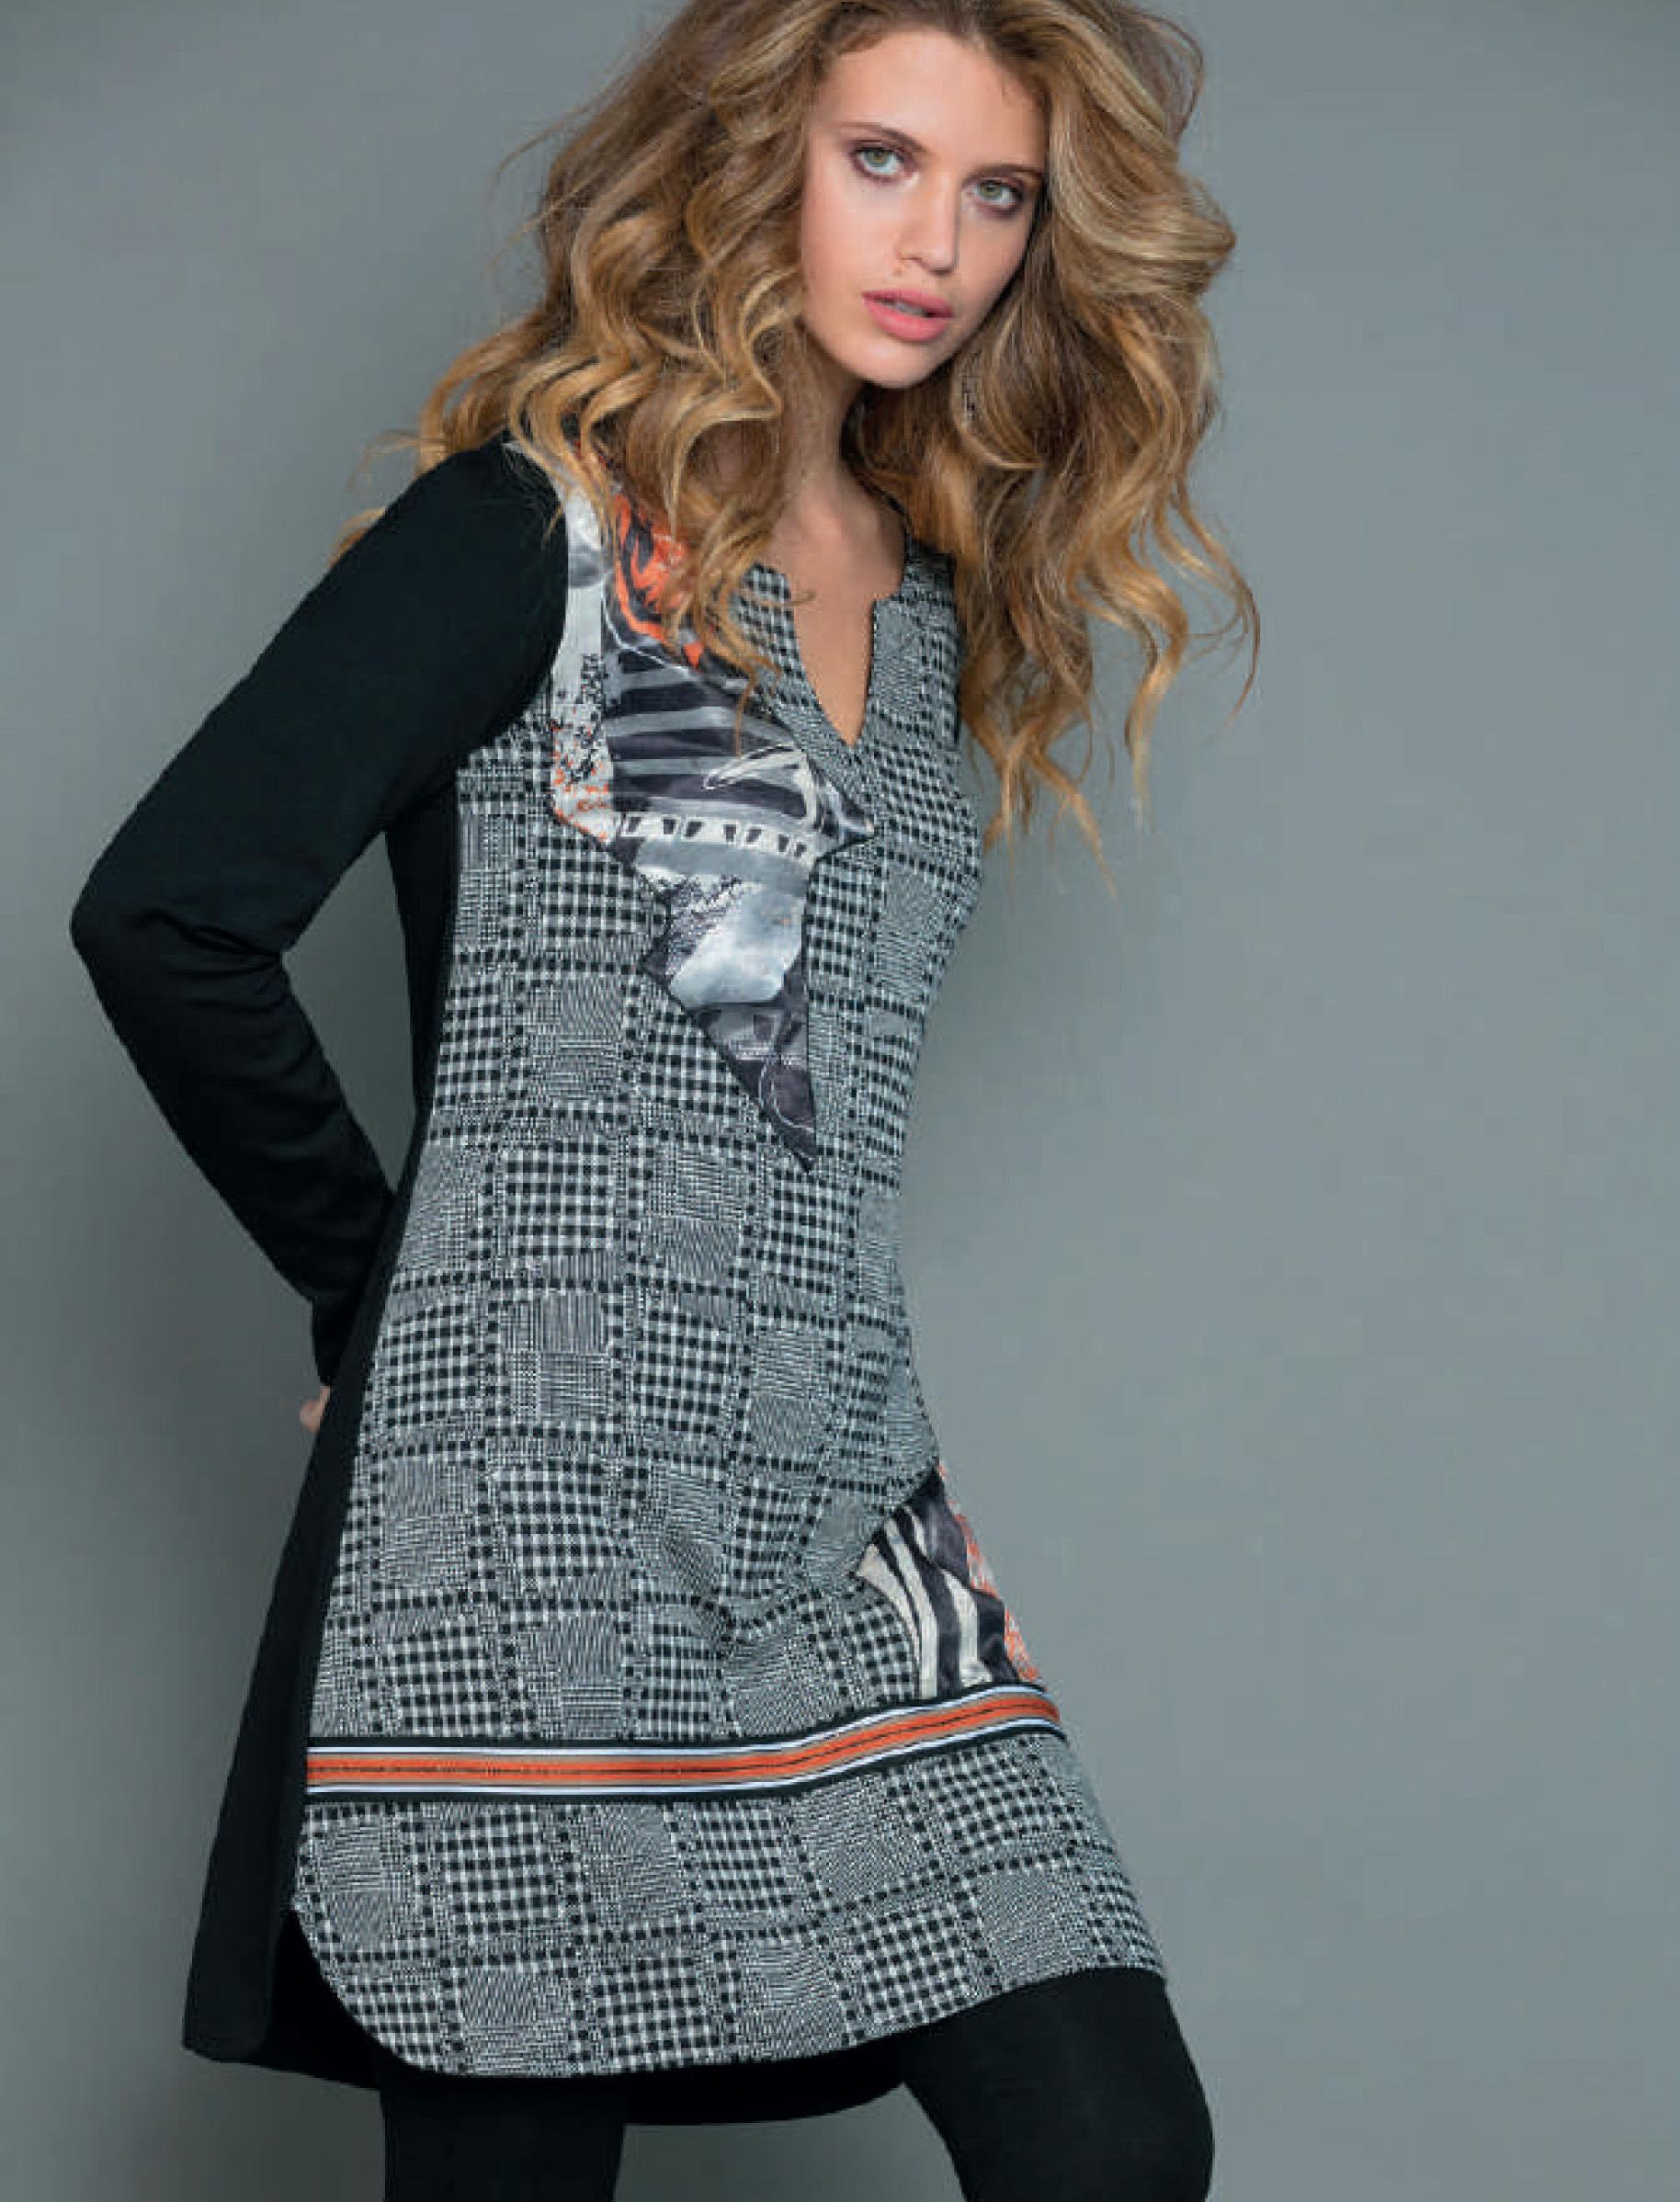 Maloka: Jazz Girl Printed Jacquard Stretch Slip Dress MK_JAMILE